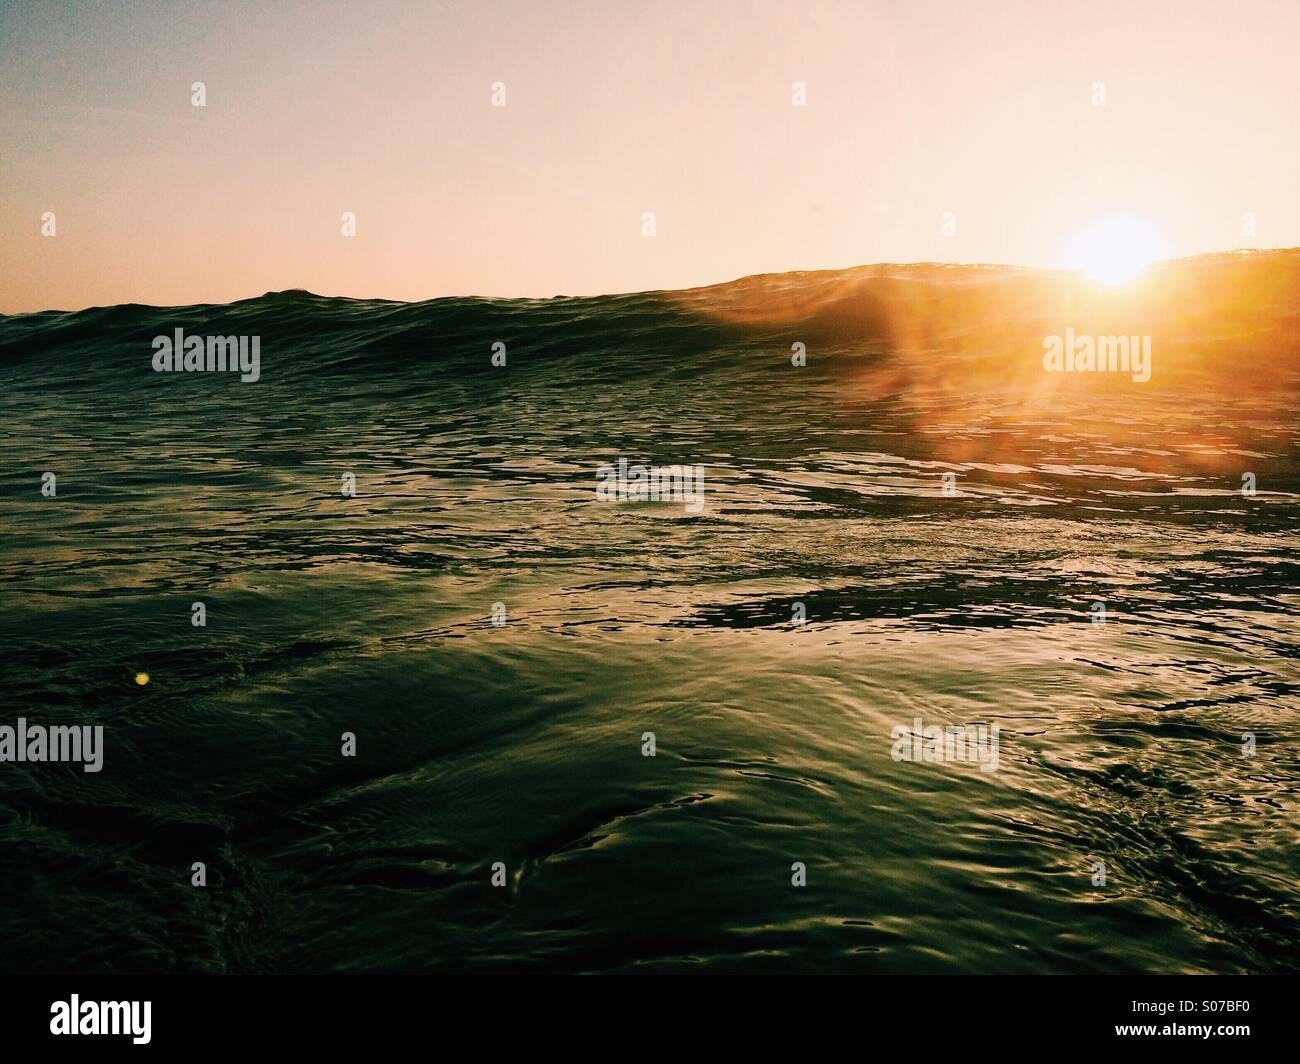 Sunlight over the sea - Stock Image